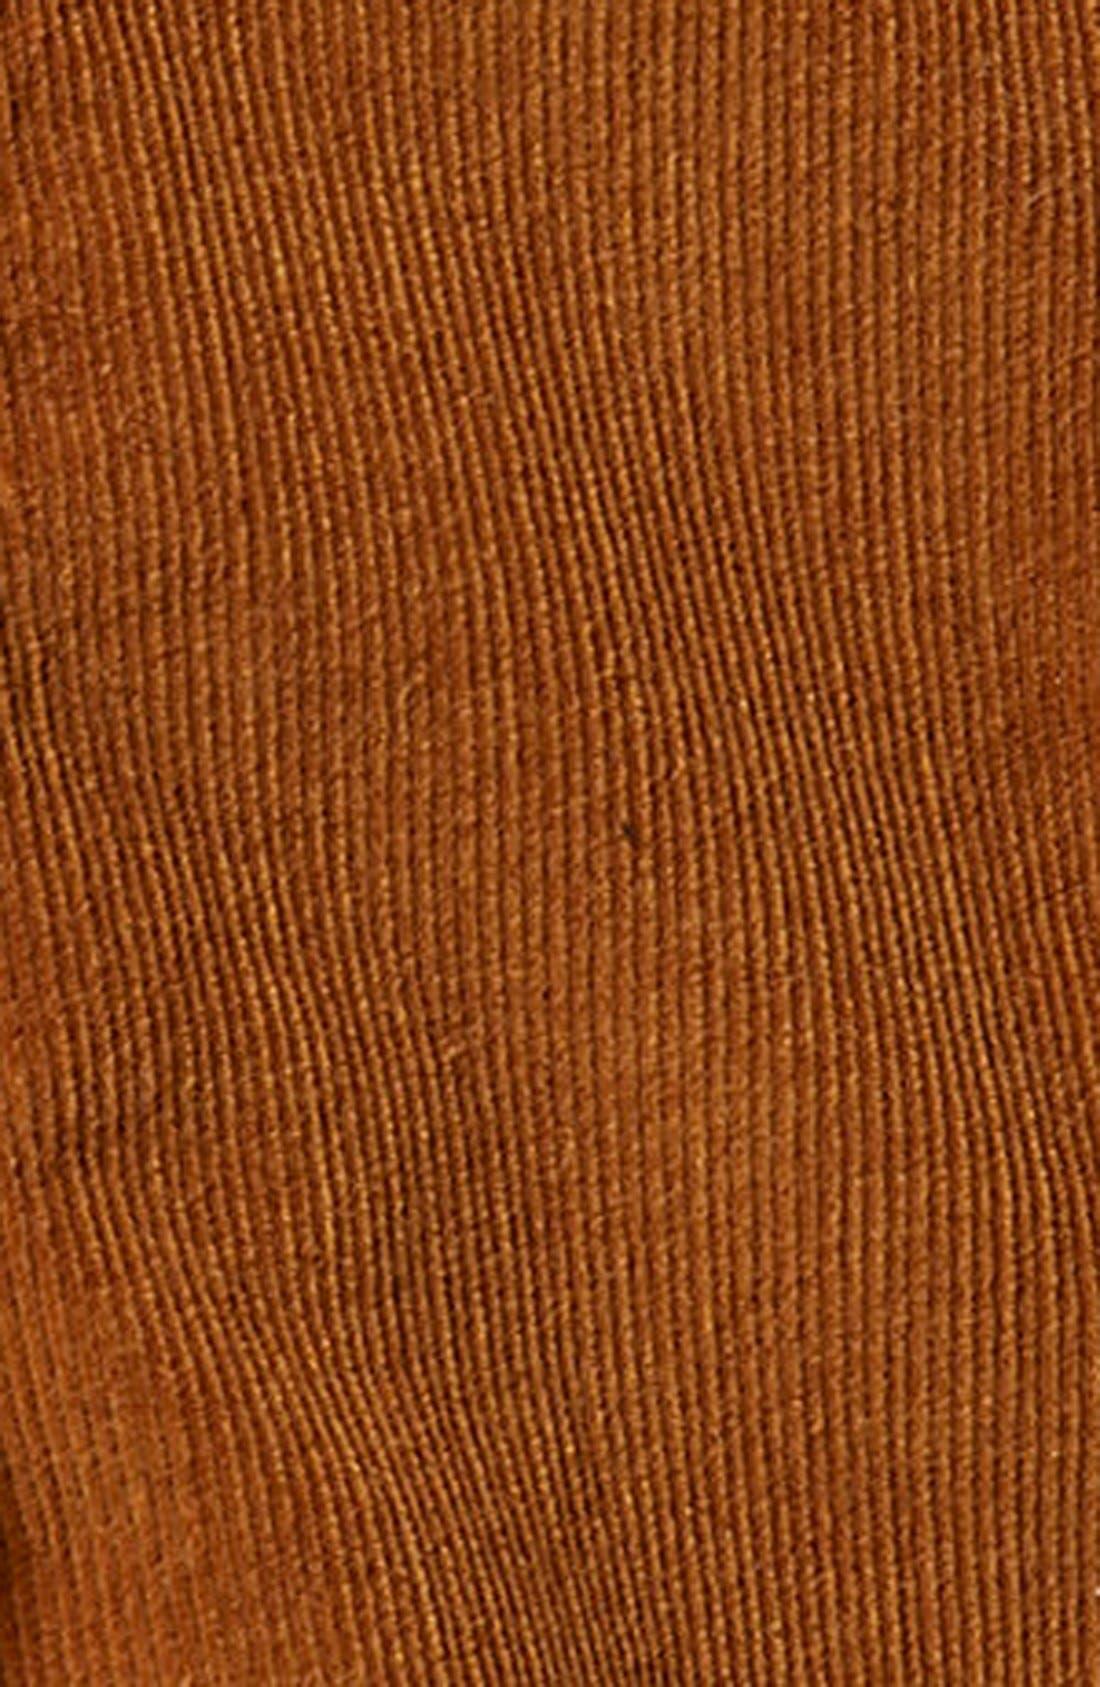 TOPSHOP, A-Line Corduroy Skirt, Alternate thumbnail 5, color, 210